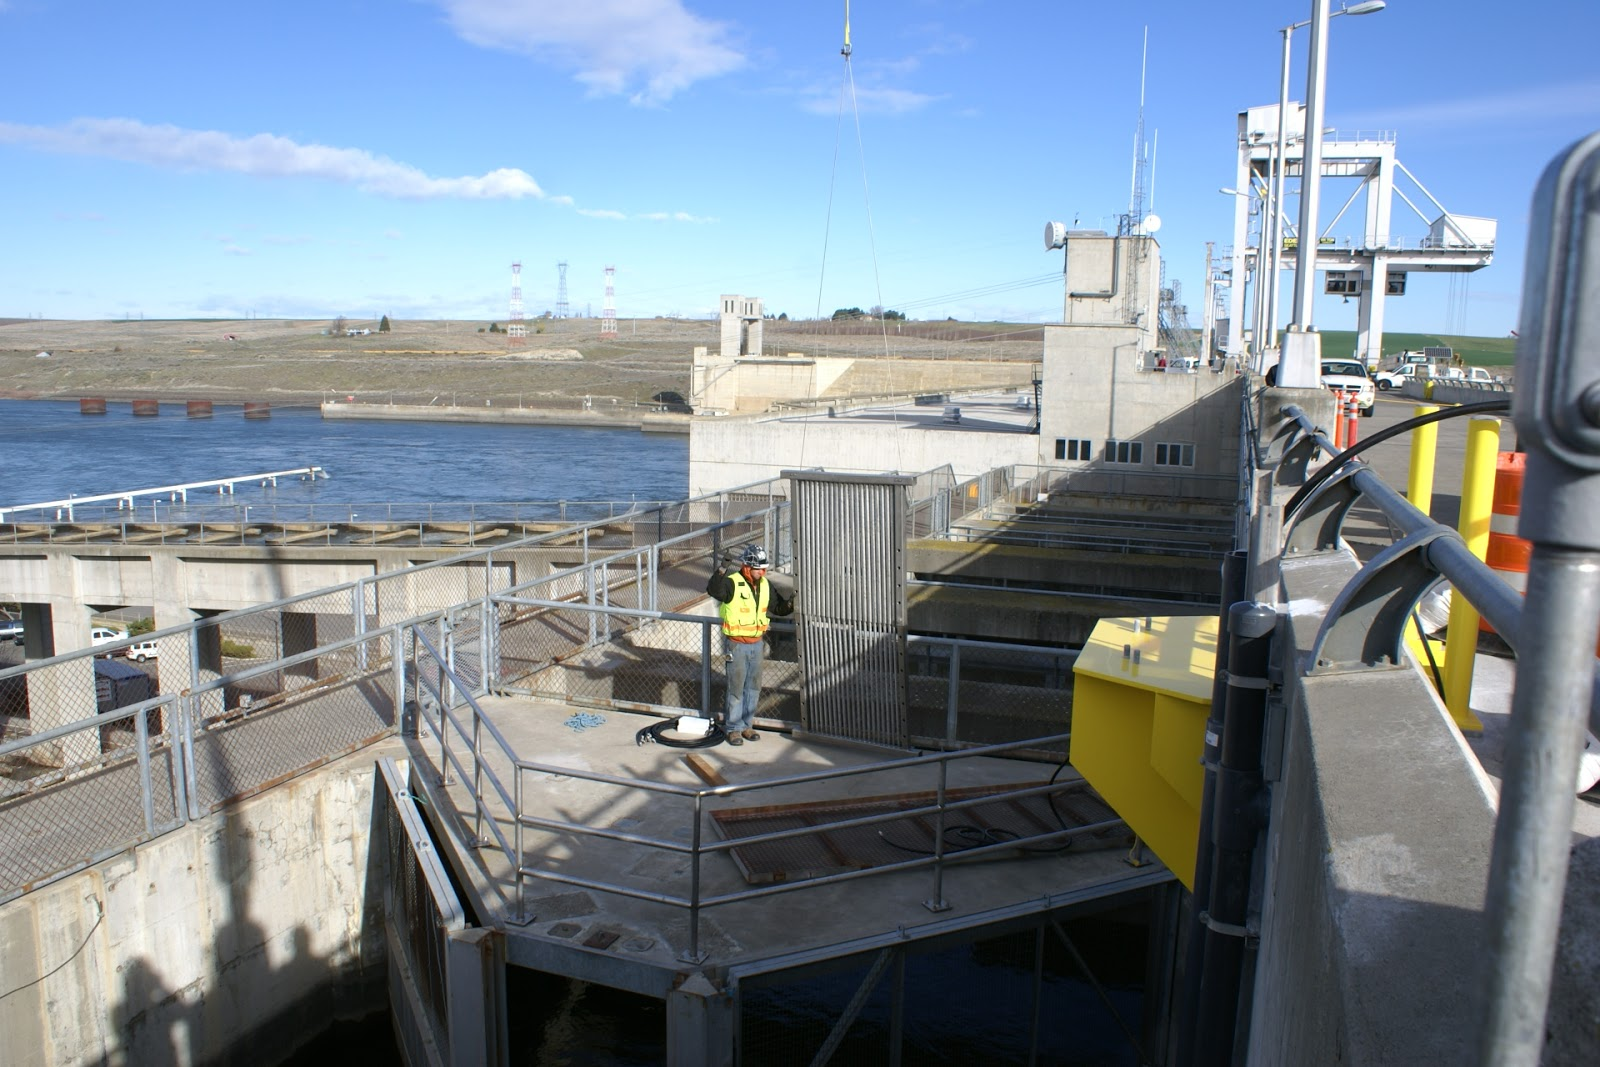 Ice Harbor Dam Adult Fishtrap Mod